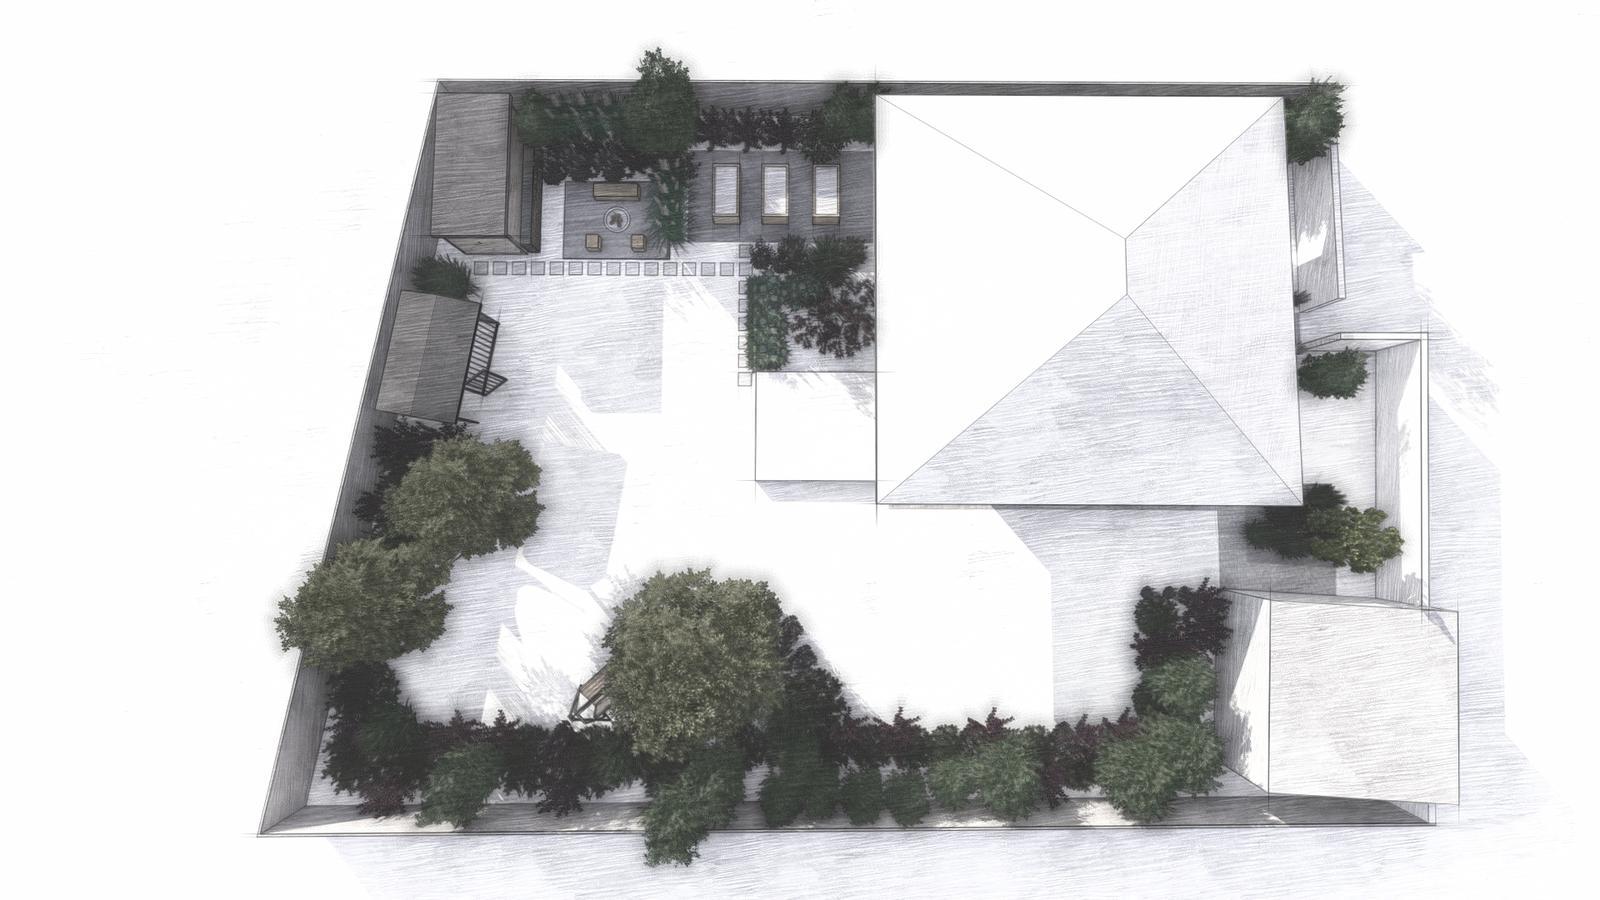 Návrh záhrady rodinného domu - Obrázok č. 2